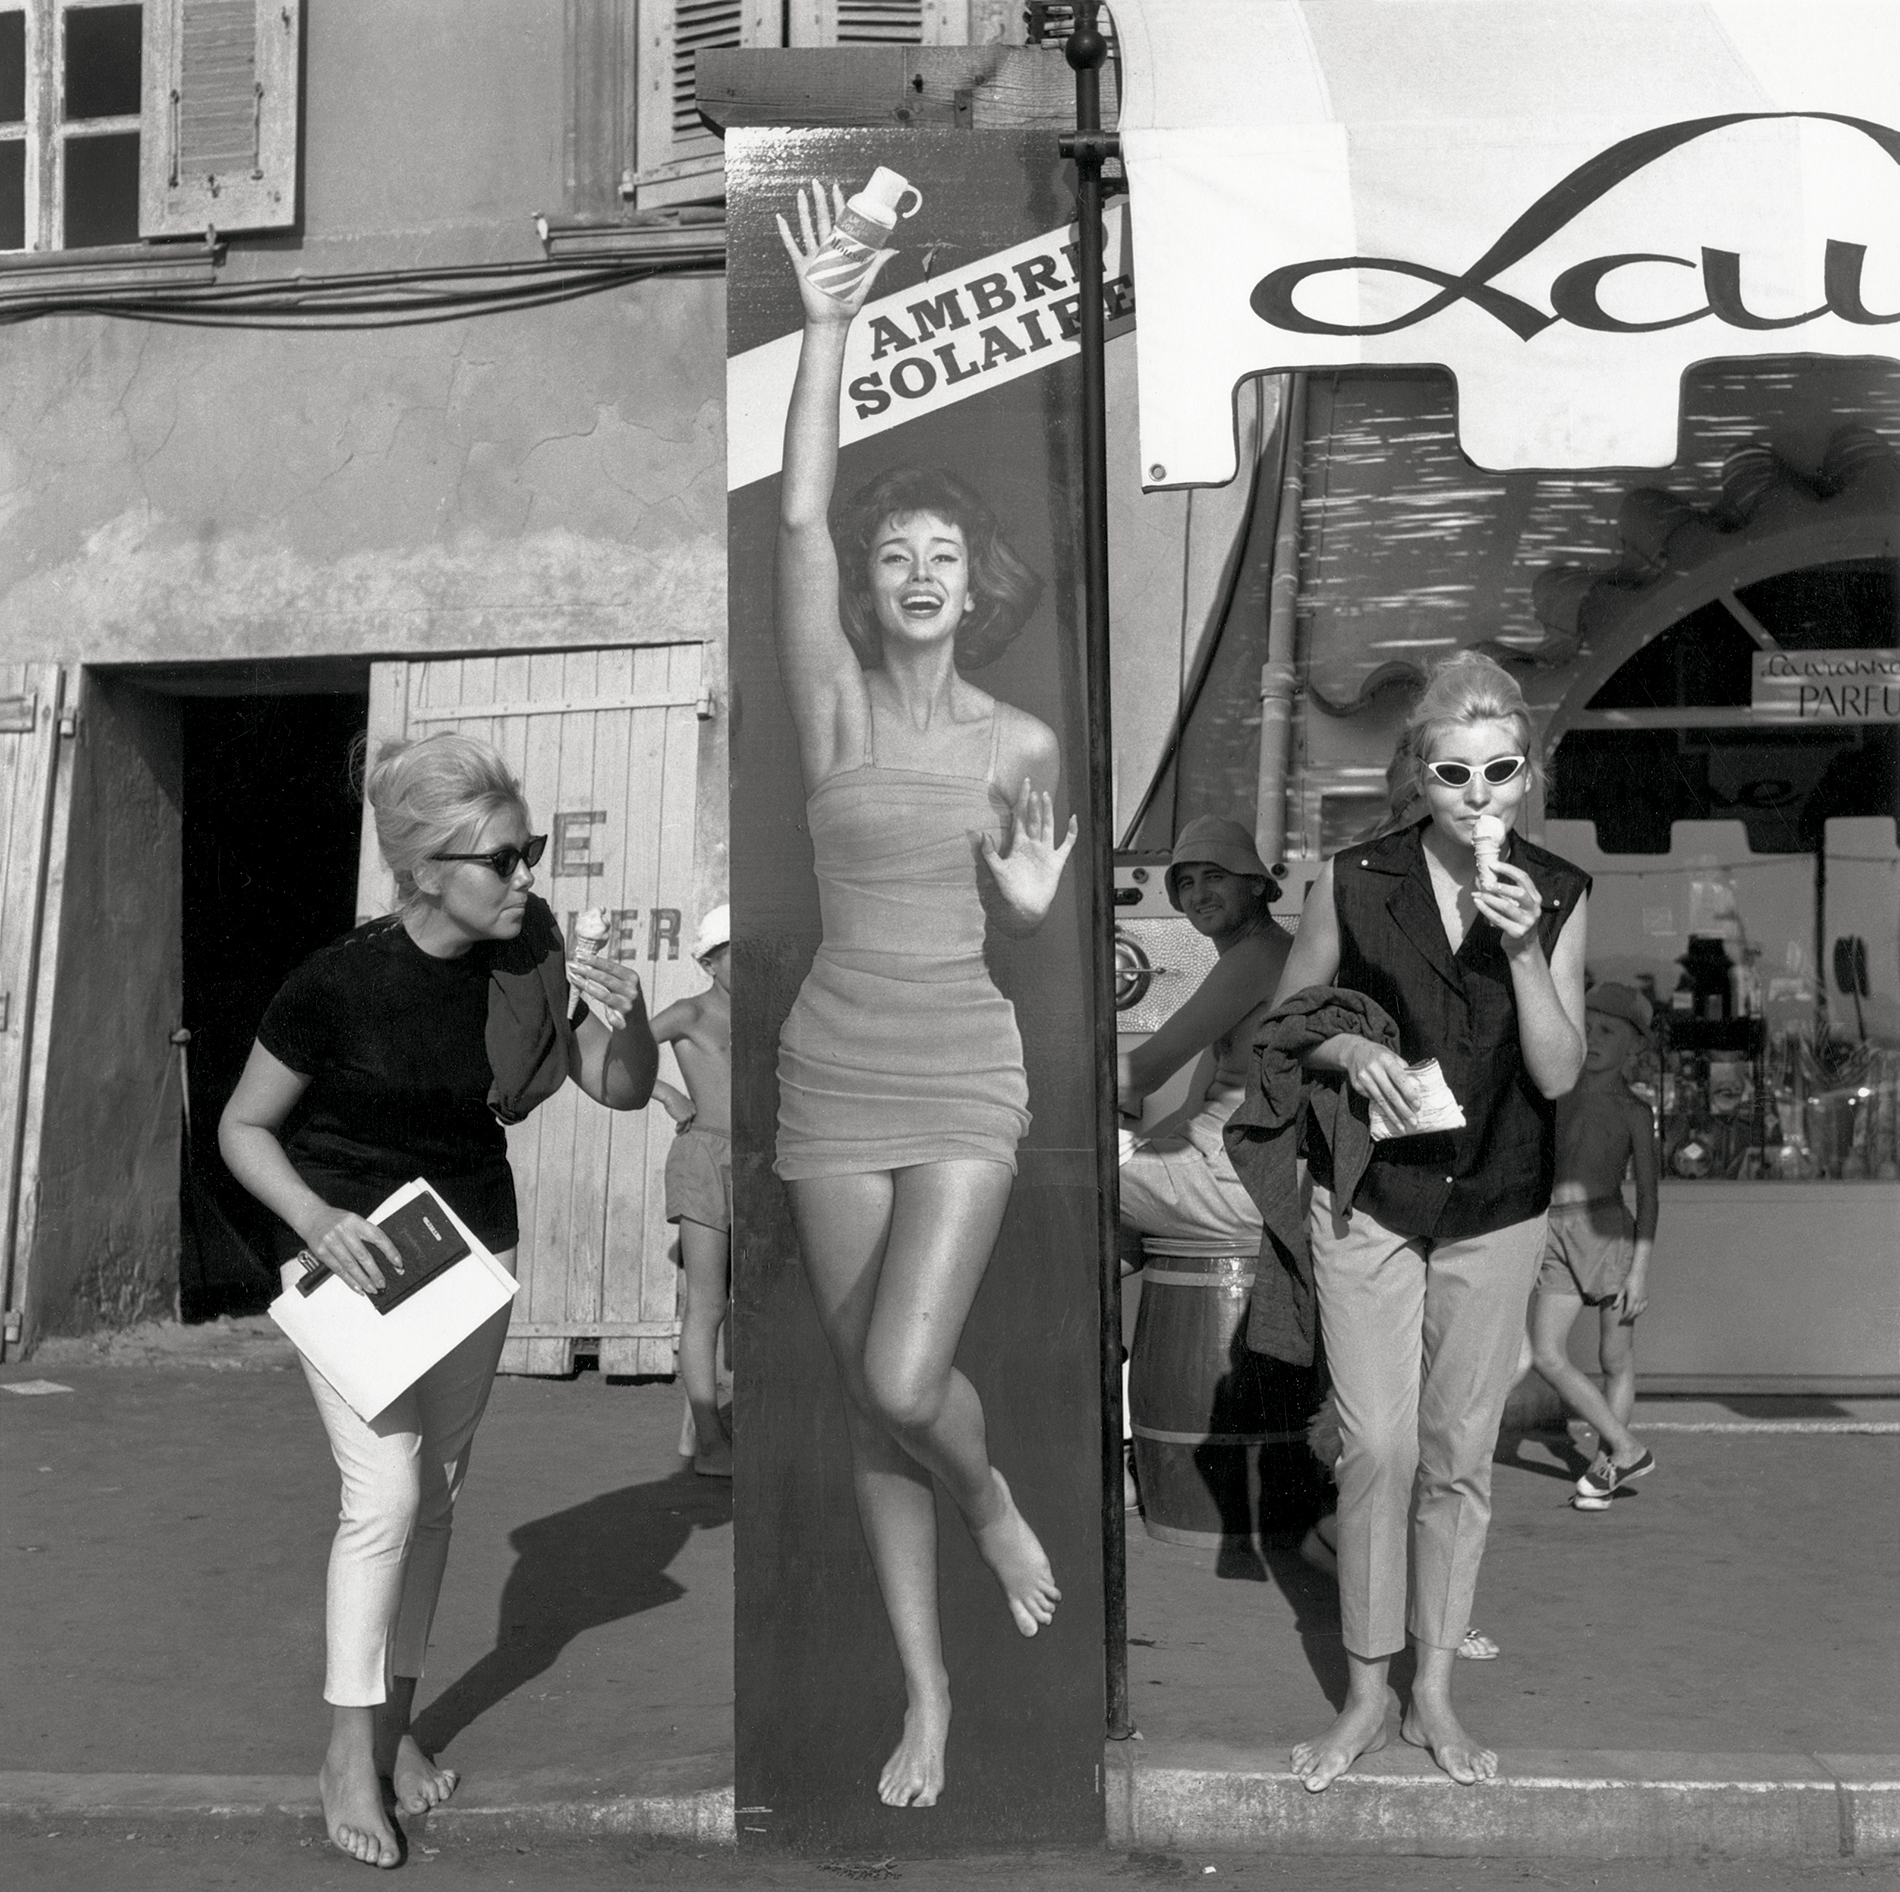 1959. Ла-Боль-Эскублак, август